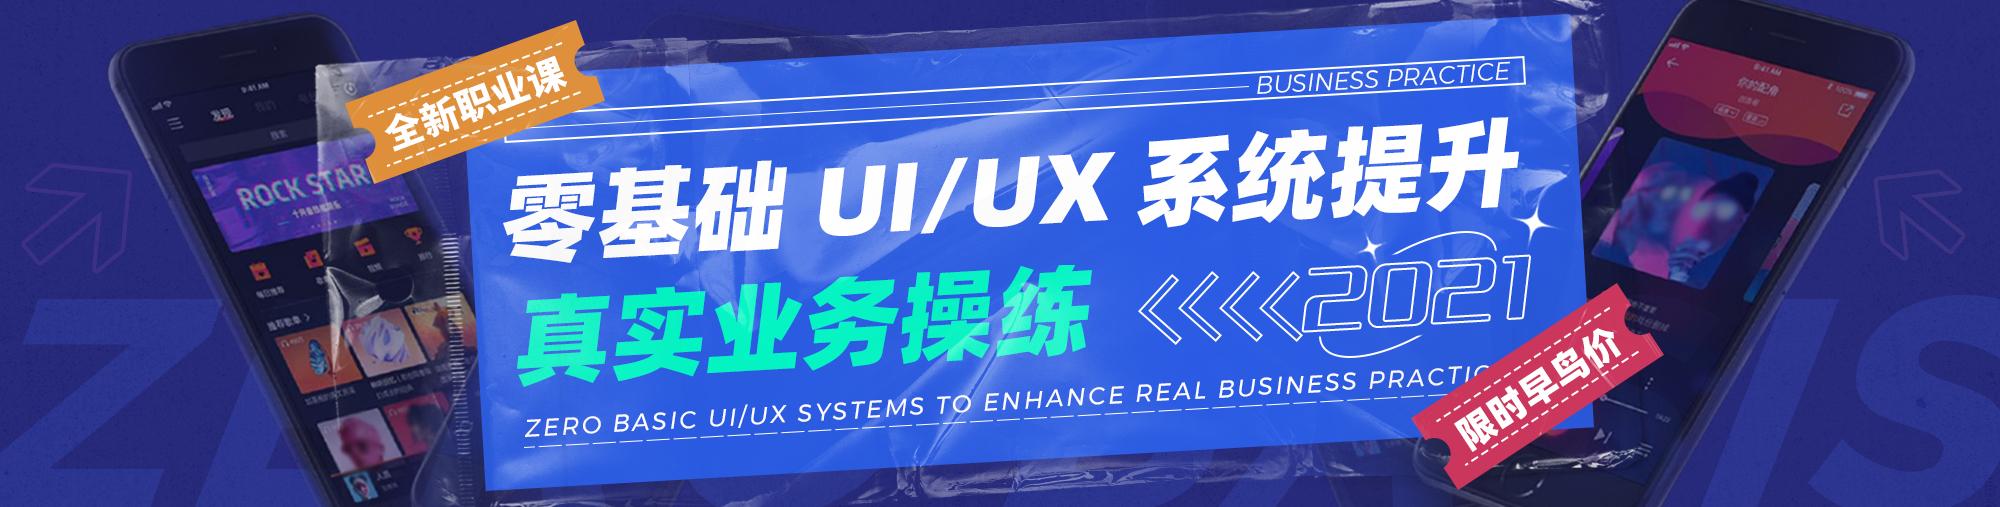 UI/UX设计师培养计划